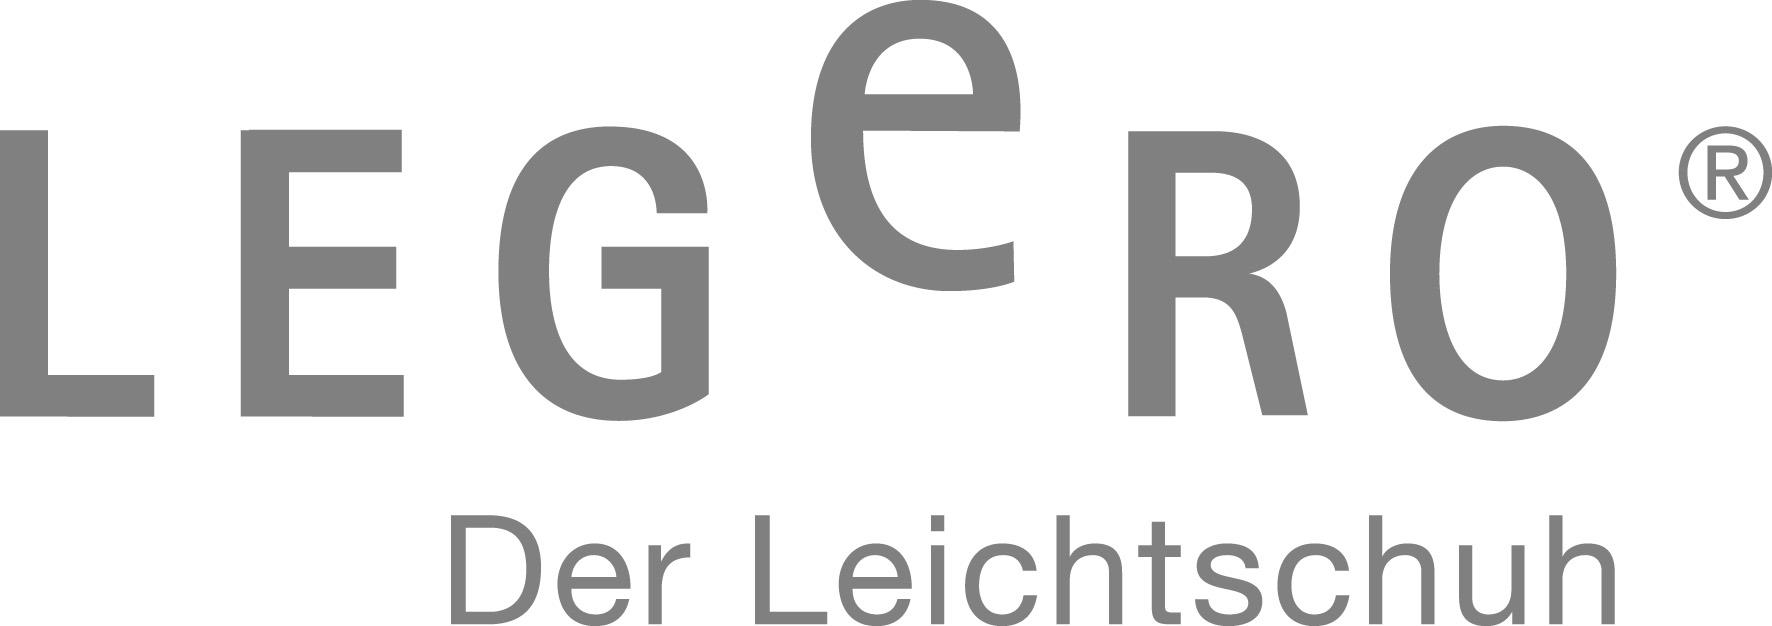 legero-logo